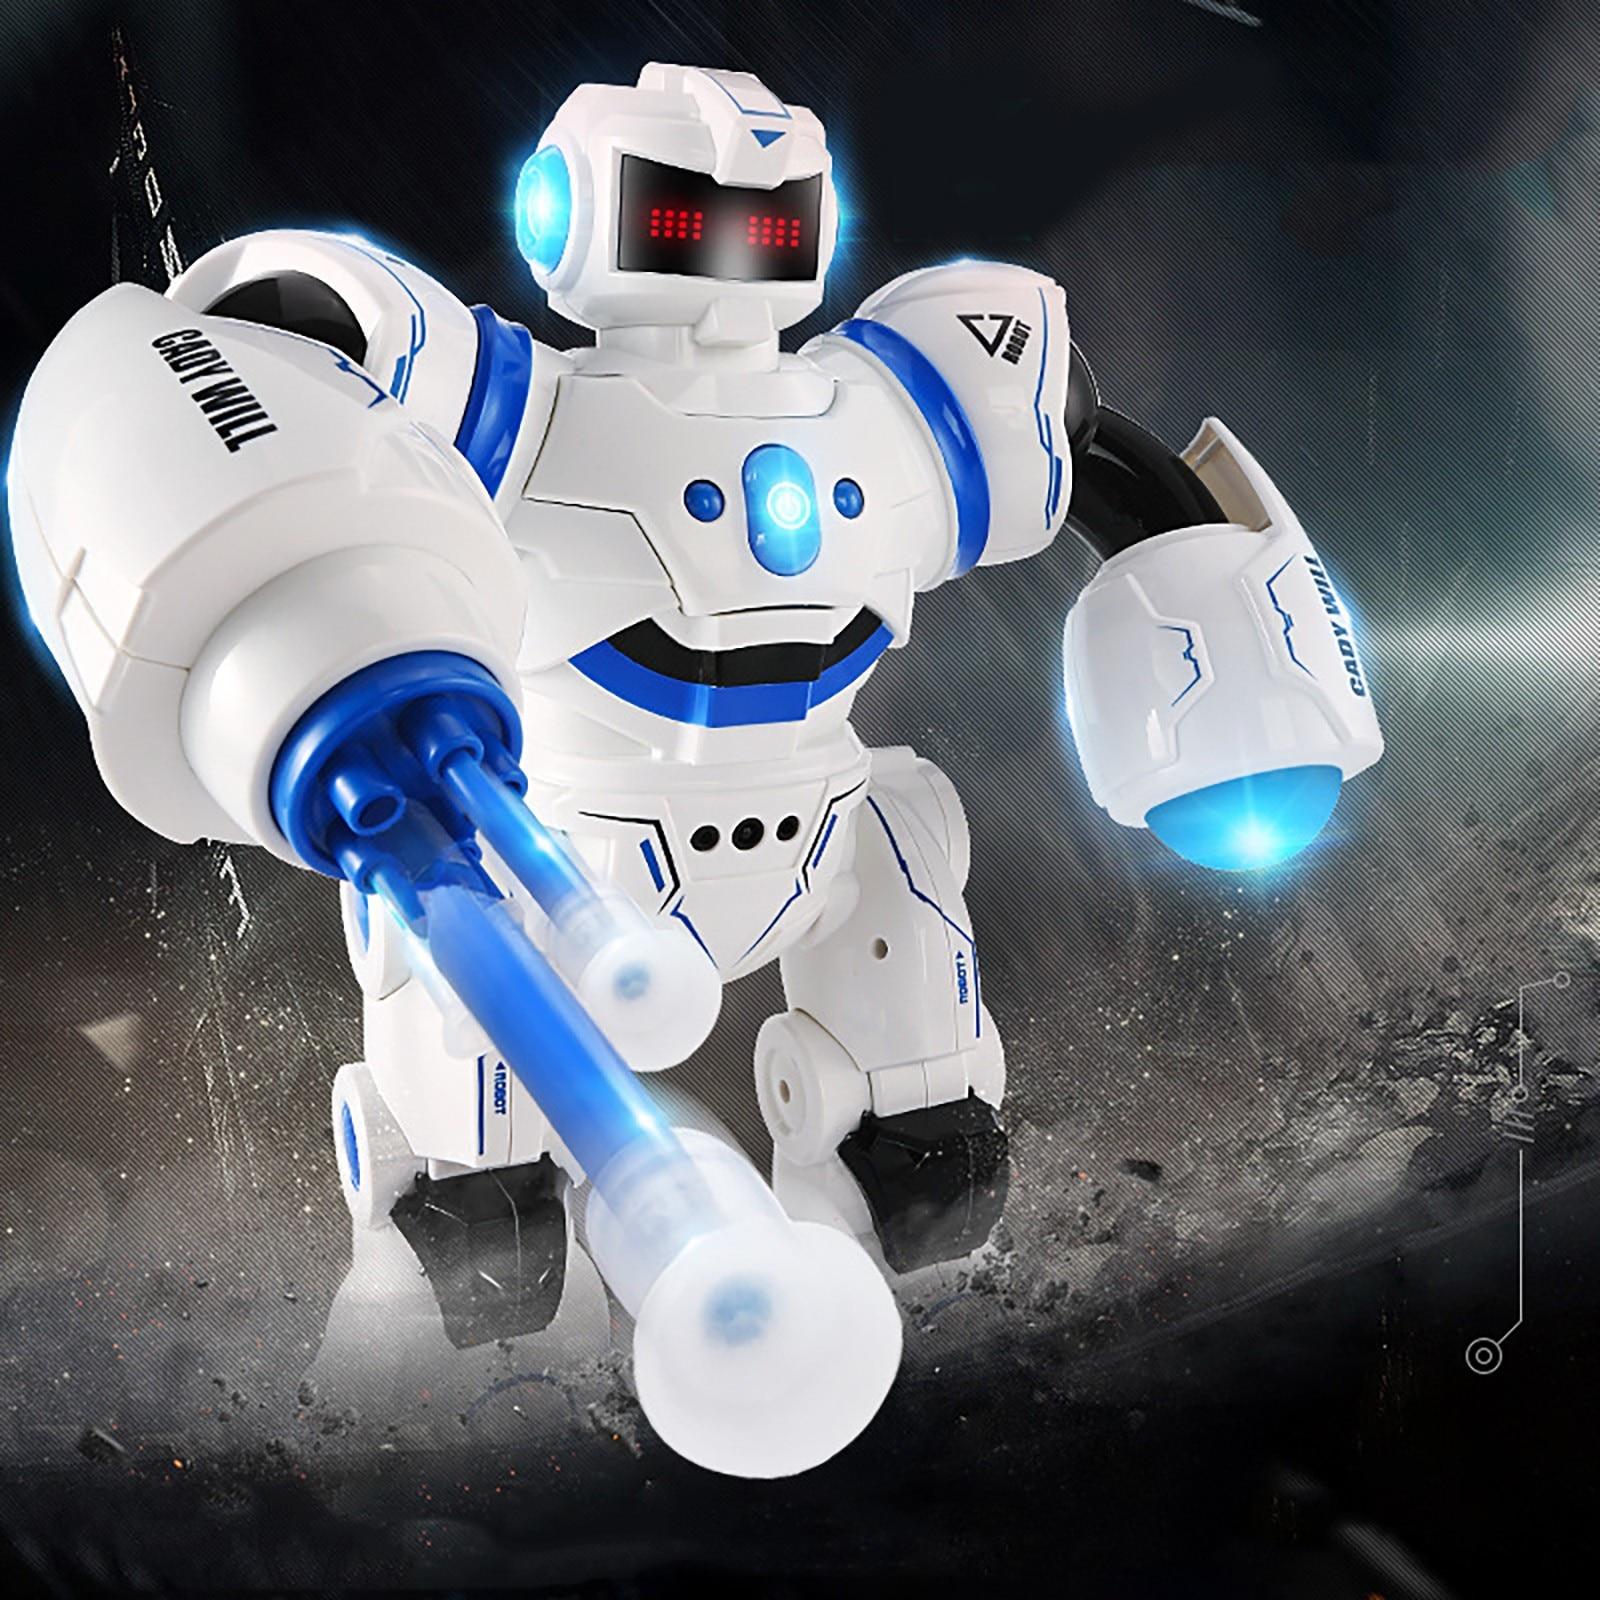 Jjr/c K1 Programmable Remote Control Intelligent Early Education Robot Remote Control Programmable Gesture Sensor Music Dance